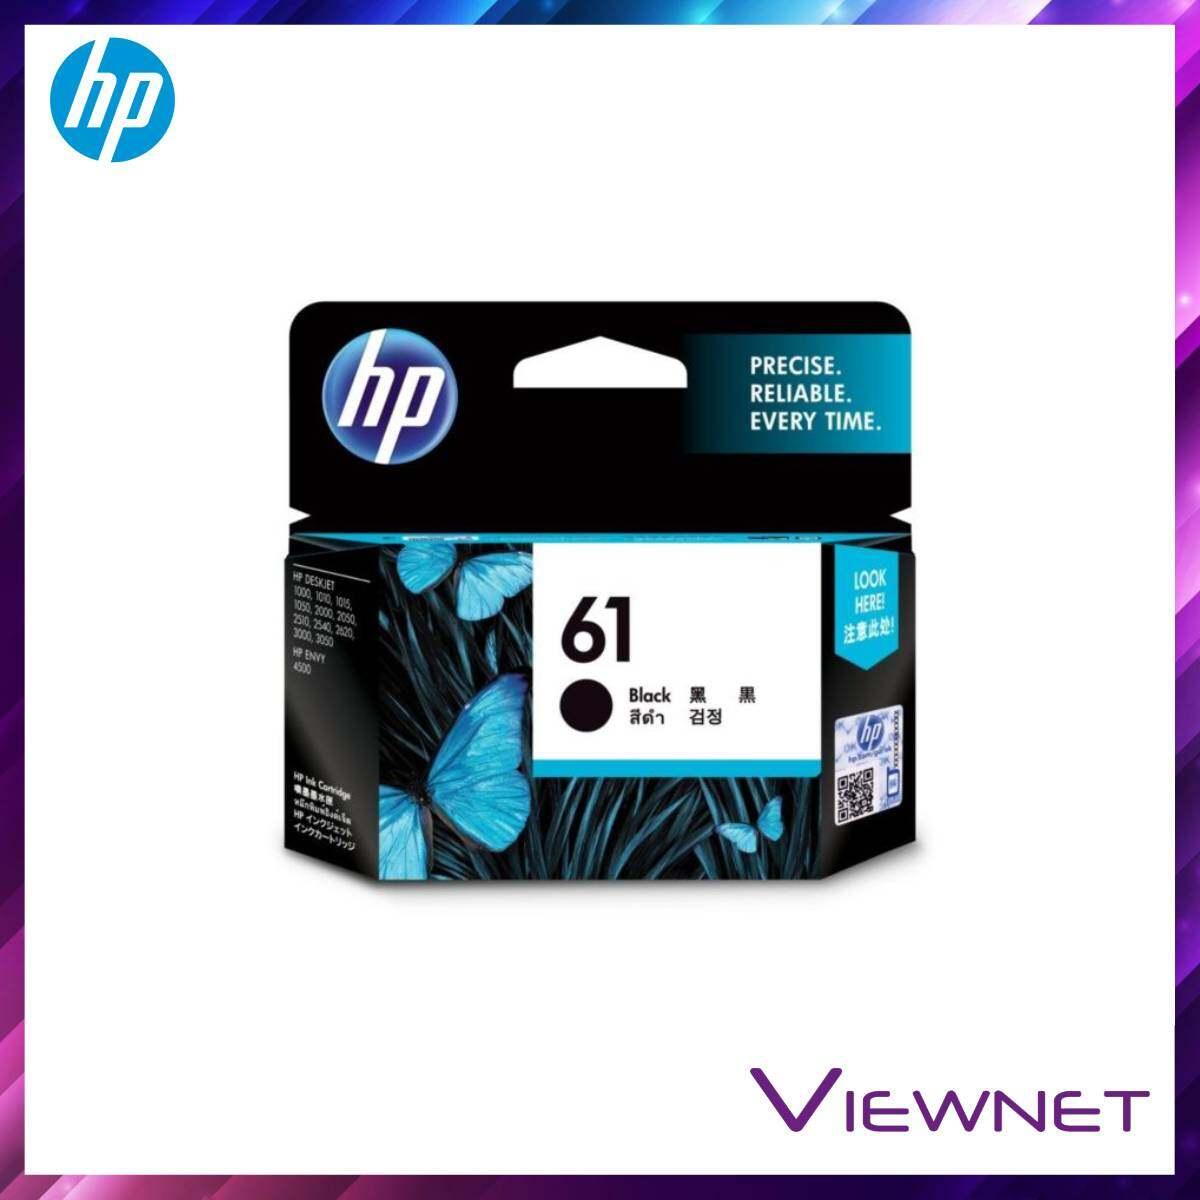 HP Ink Cartridge (CR311AA / 61) Combo Pack (Black / Tri-colour) / Black / Tri-colour